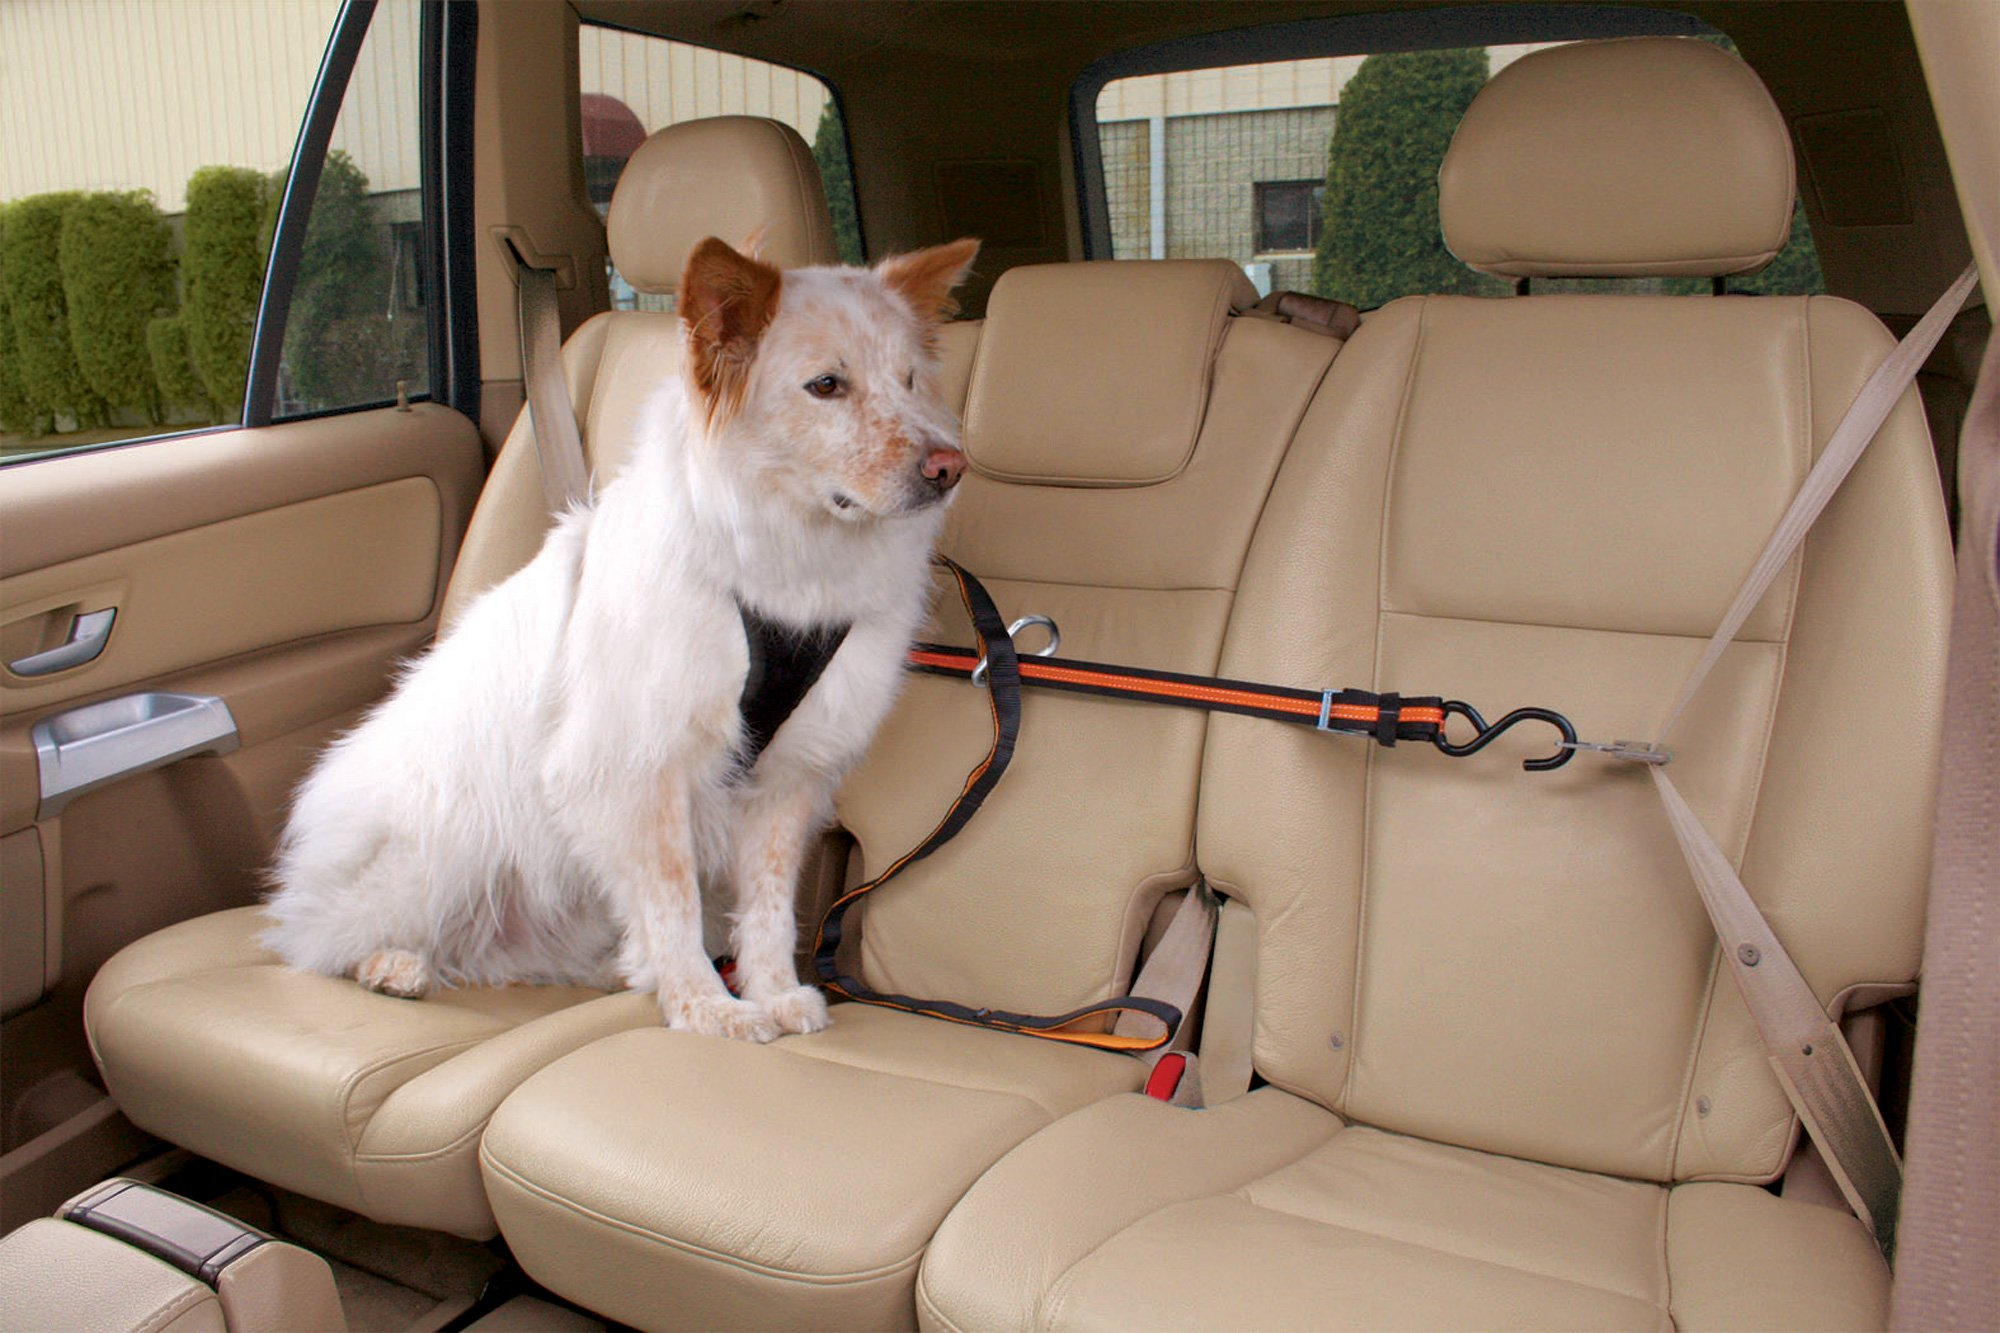 Kurgo Zip Line With Dog Leash And Carabiner